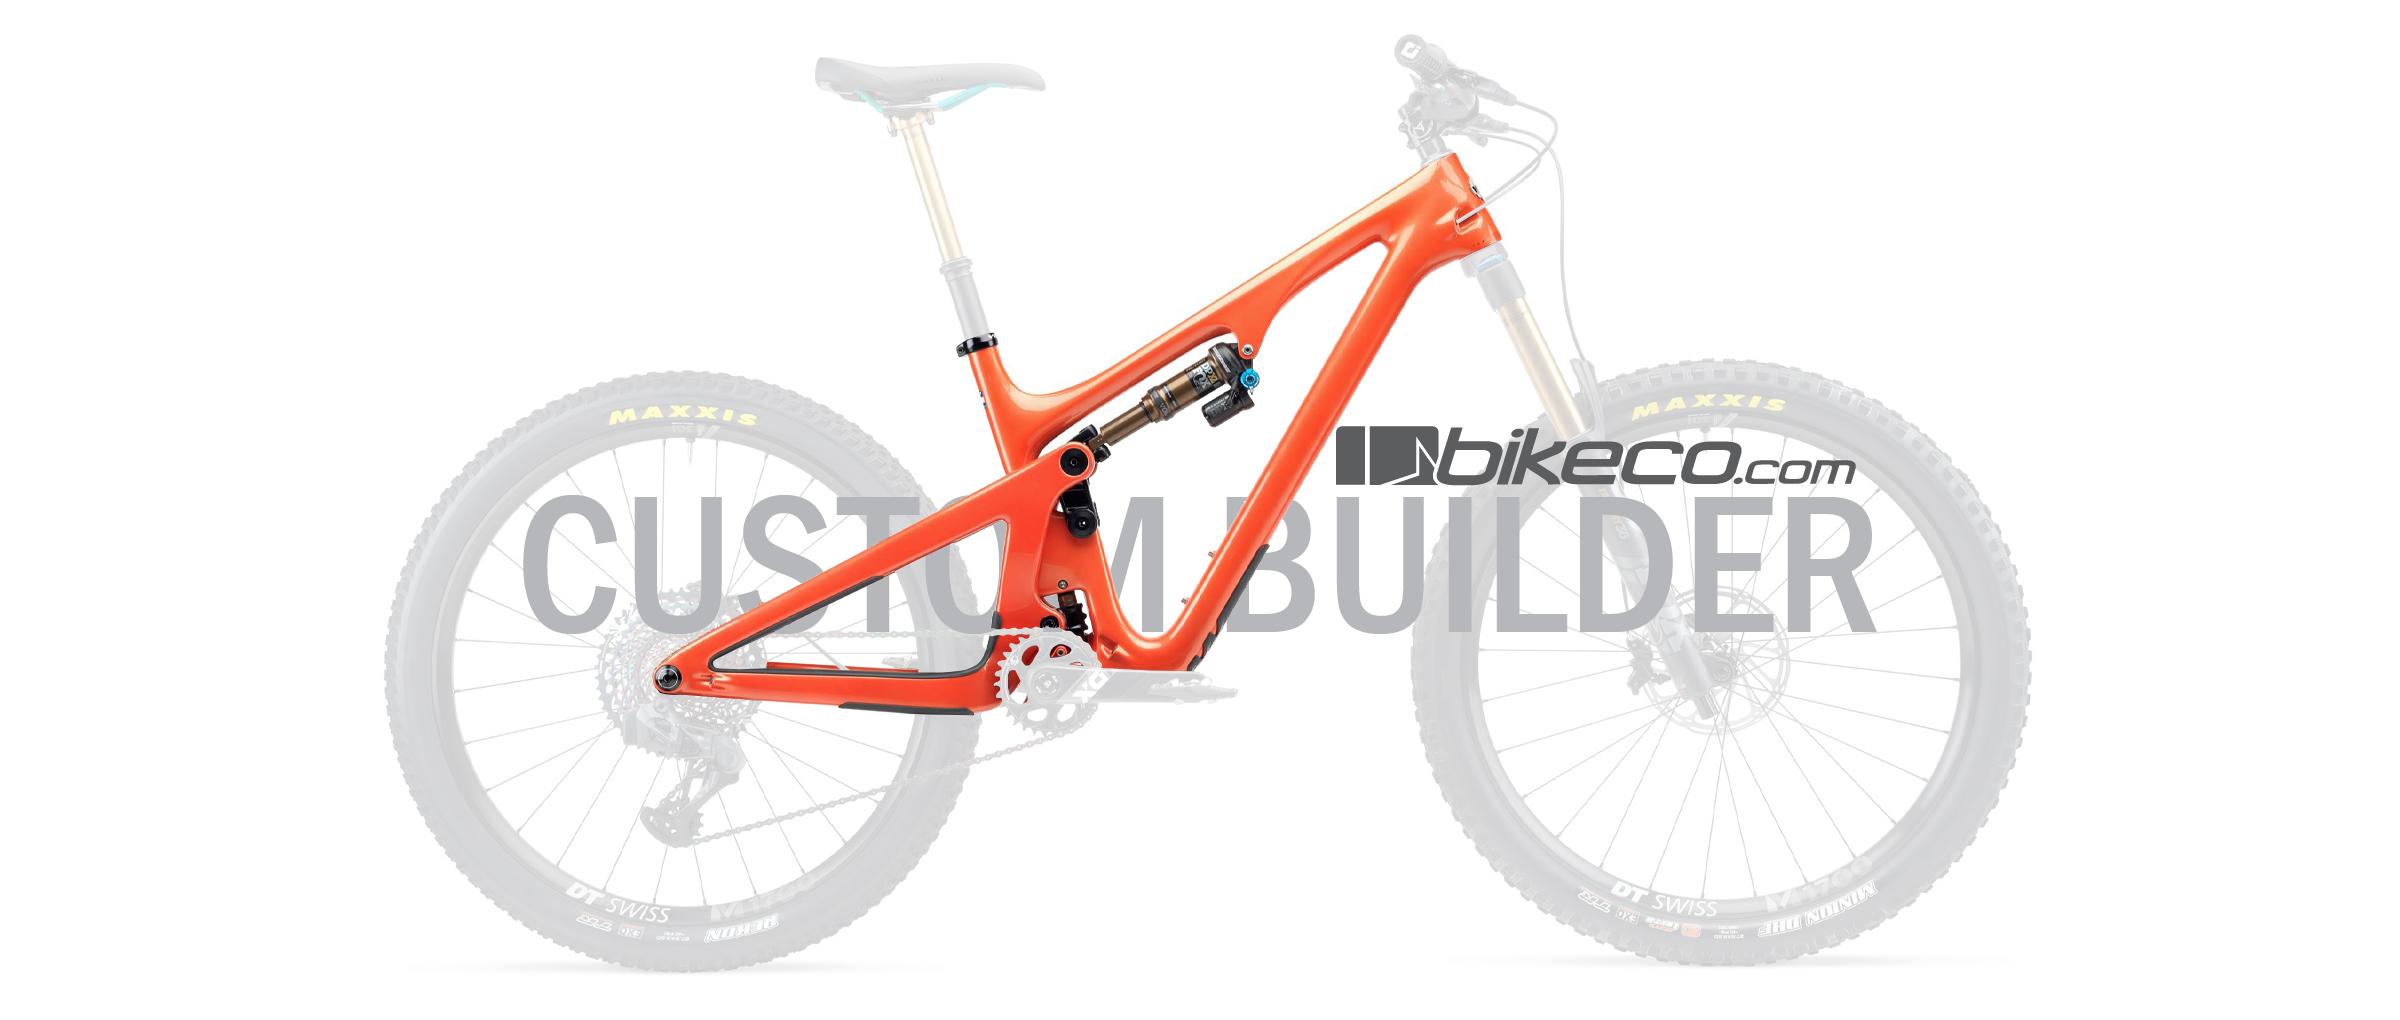 Yeti SB140 Custom Builder. Orange frame with translucent components